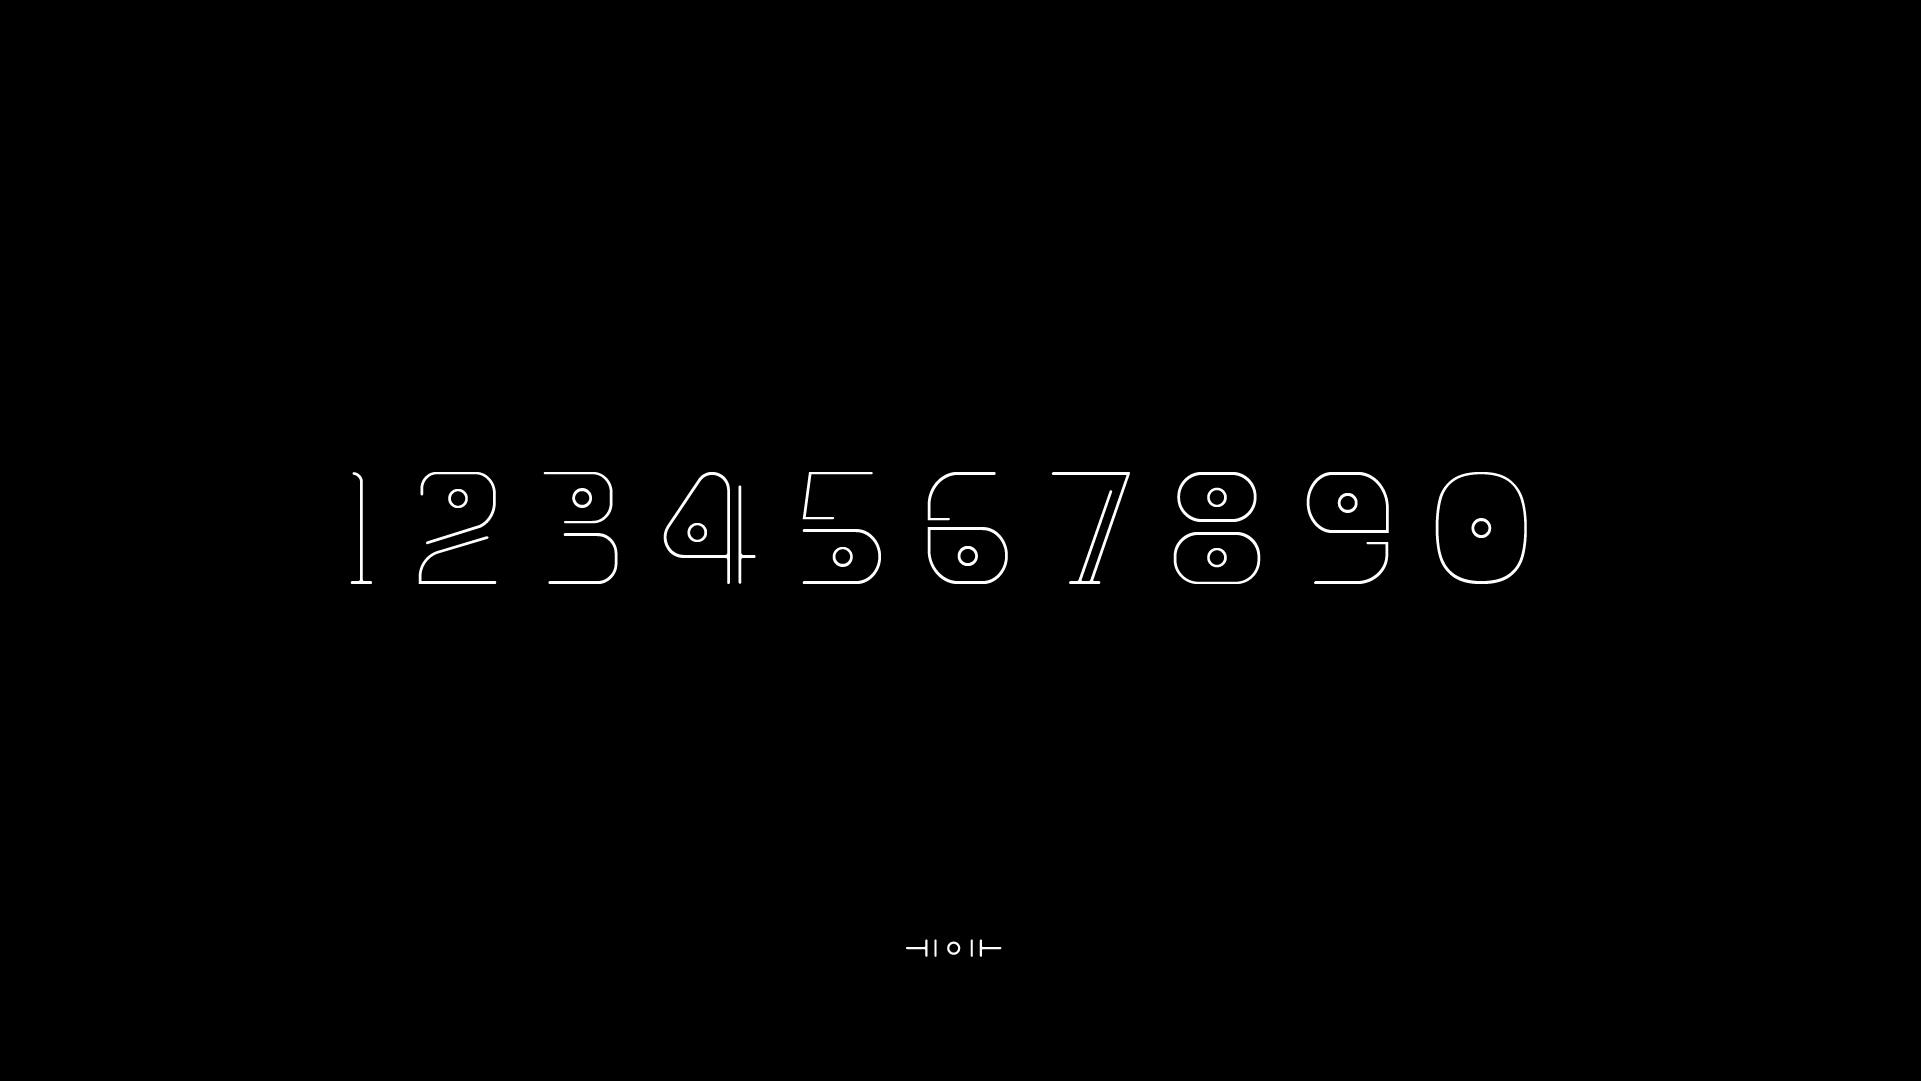 Untitled-7-26